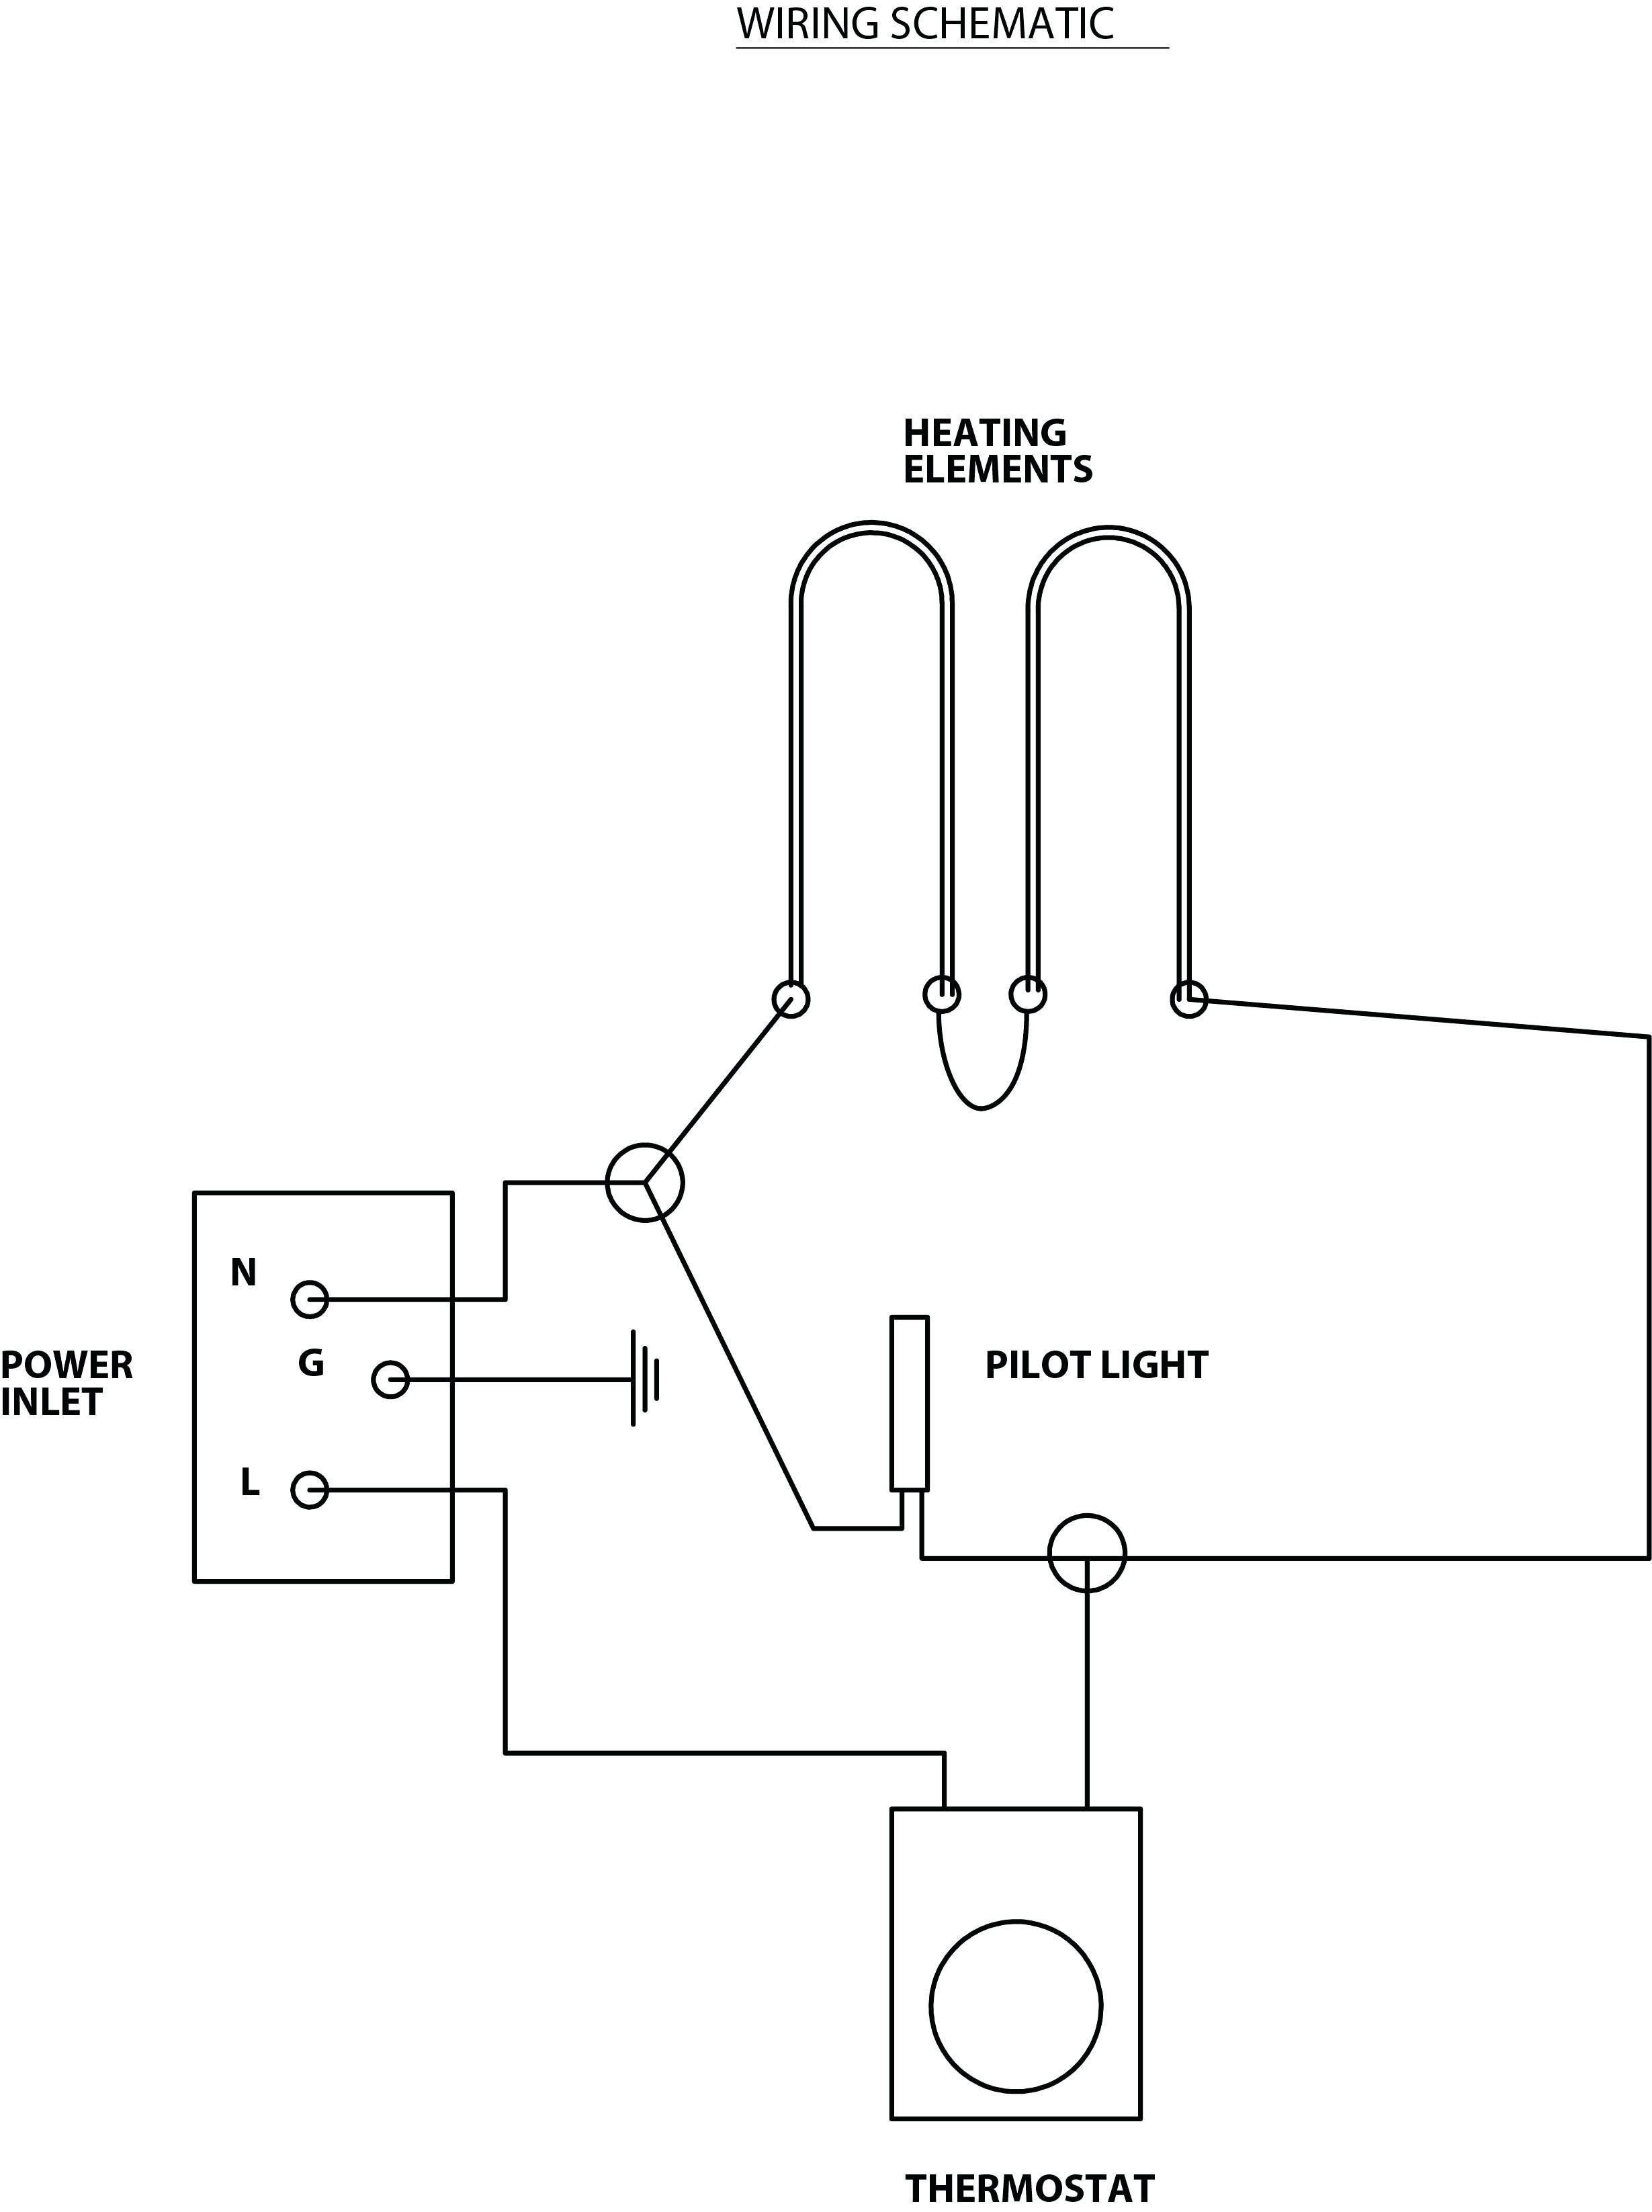 Marley Electric Baseboard Heater Wiring Diagram